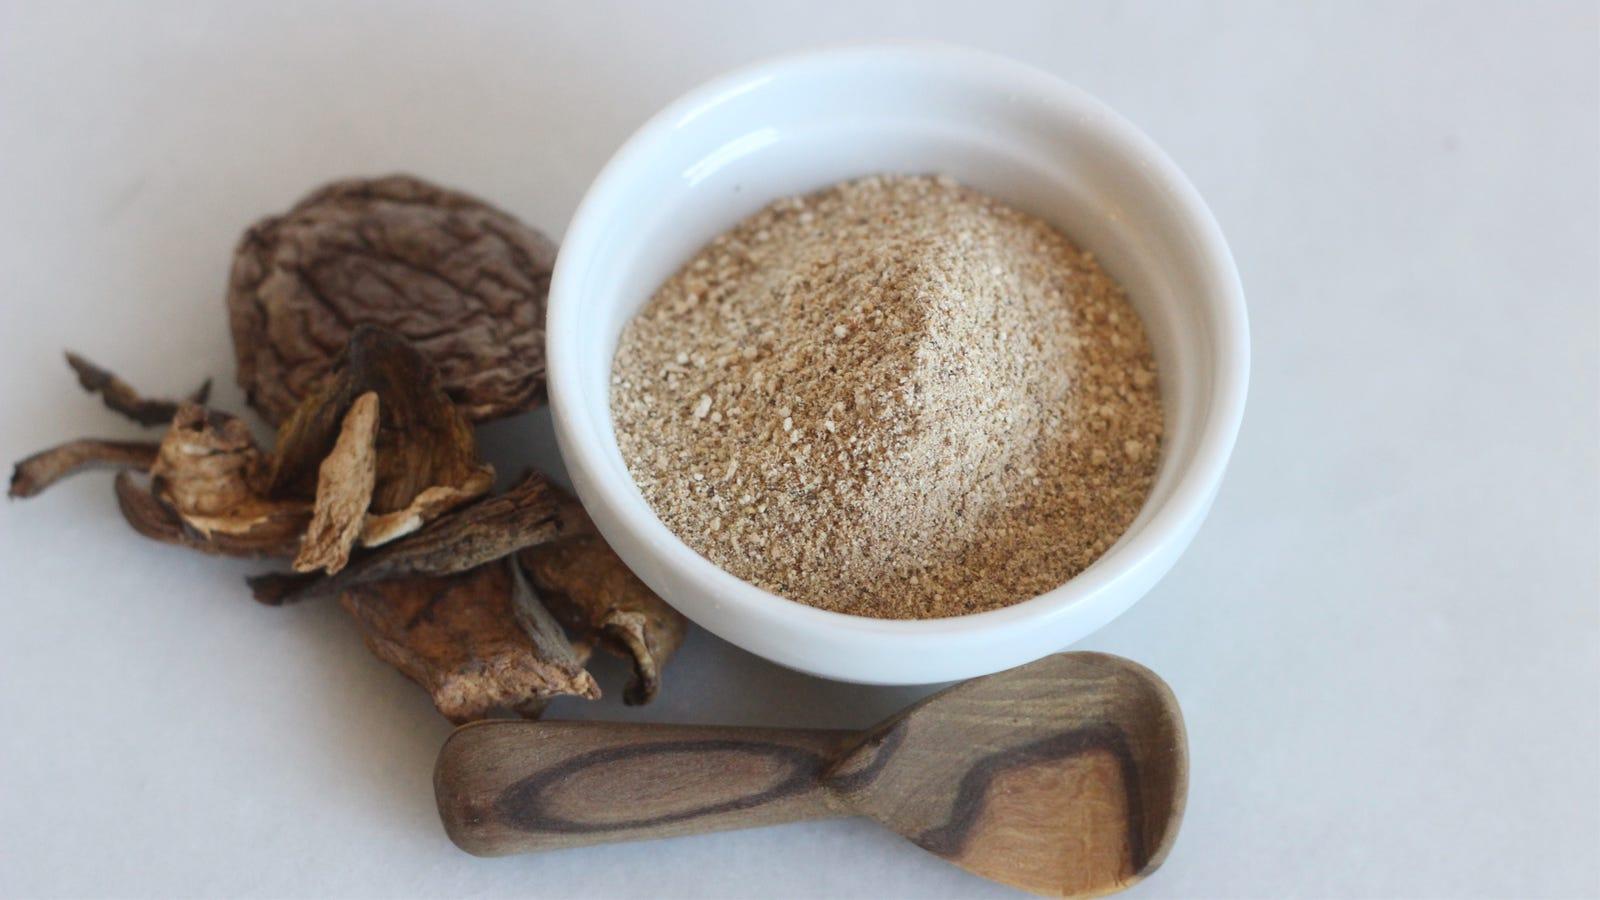 Make a Better Trader Joe's 'Umami Powder' With Dried Mushrooms